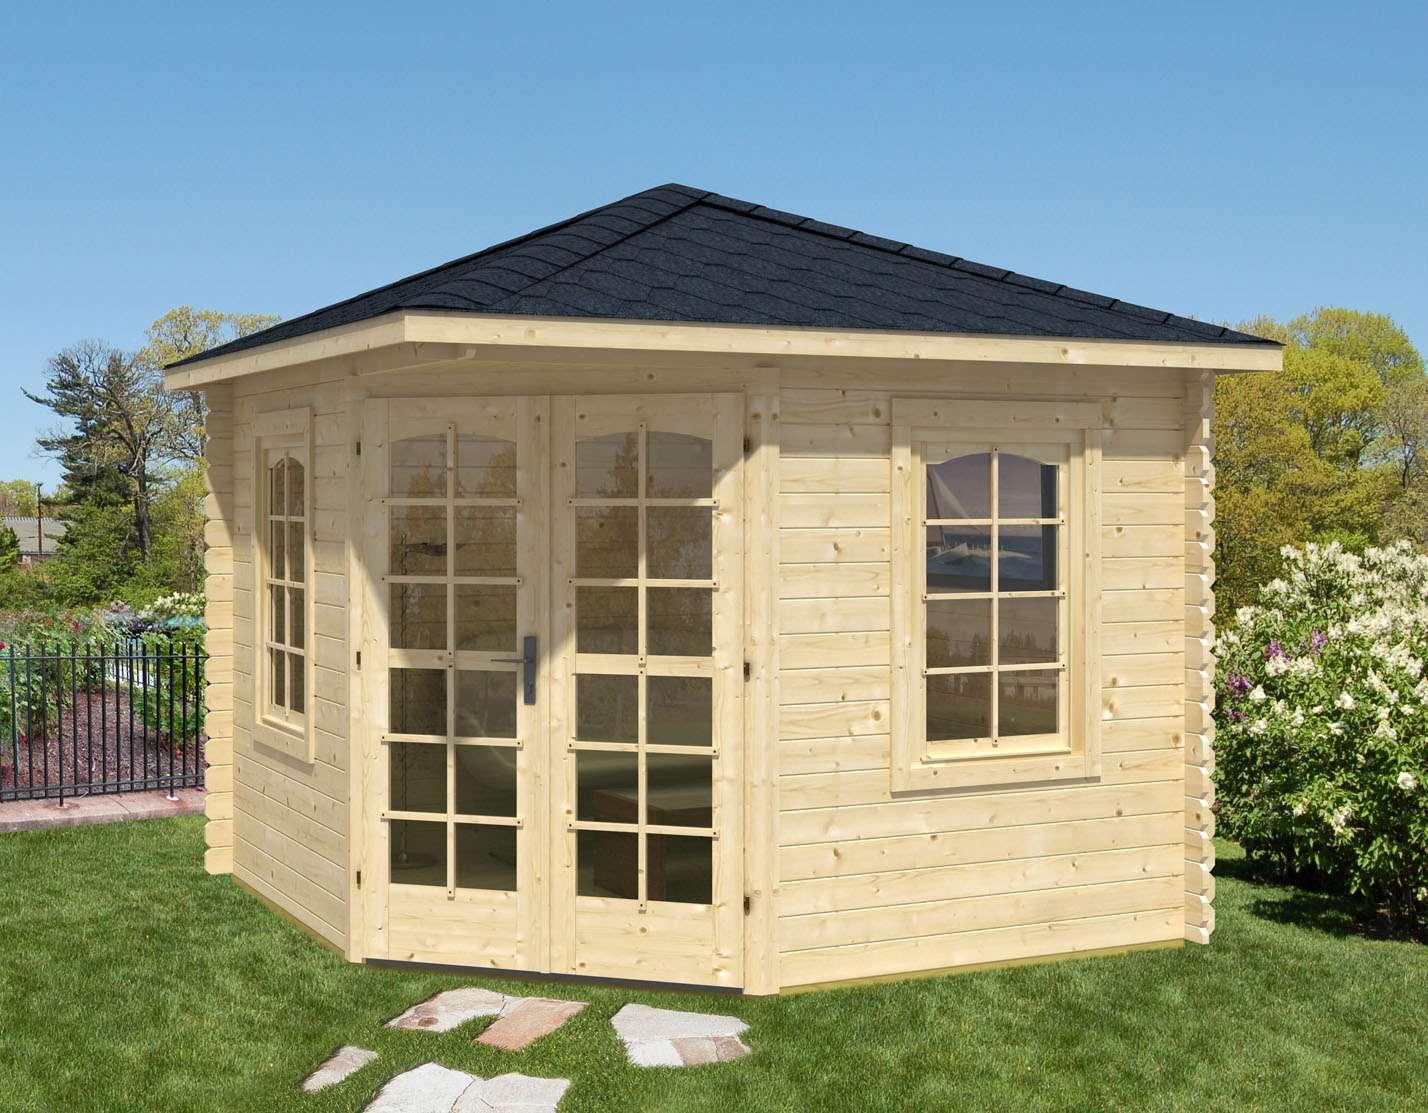 Gartenhaus 3x3m (9qm): Top Auswahl, faire Preise